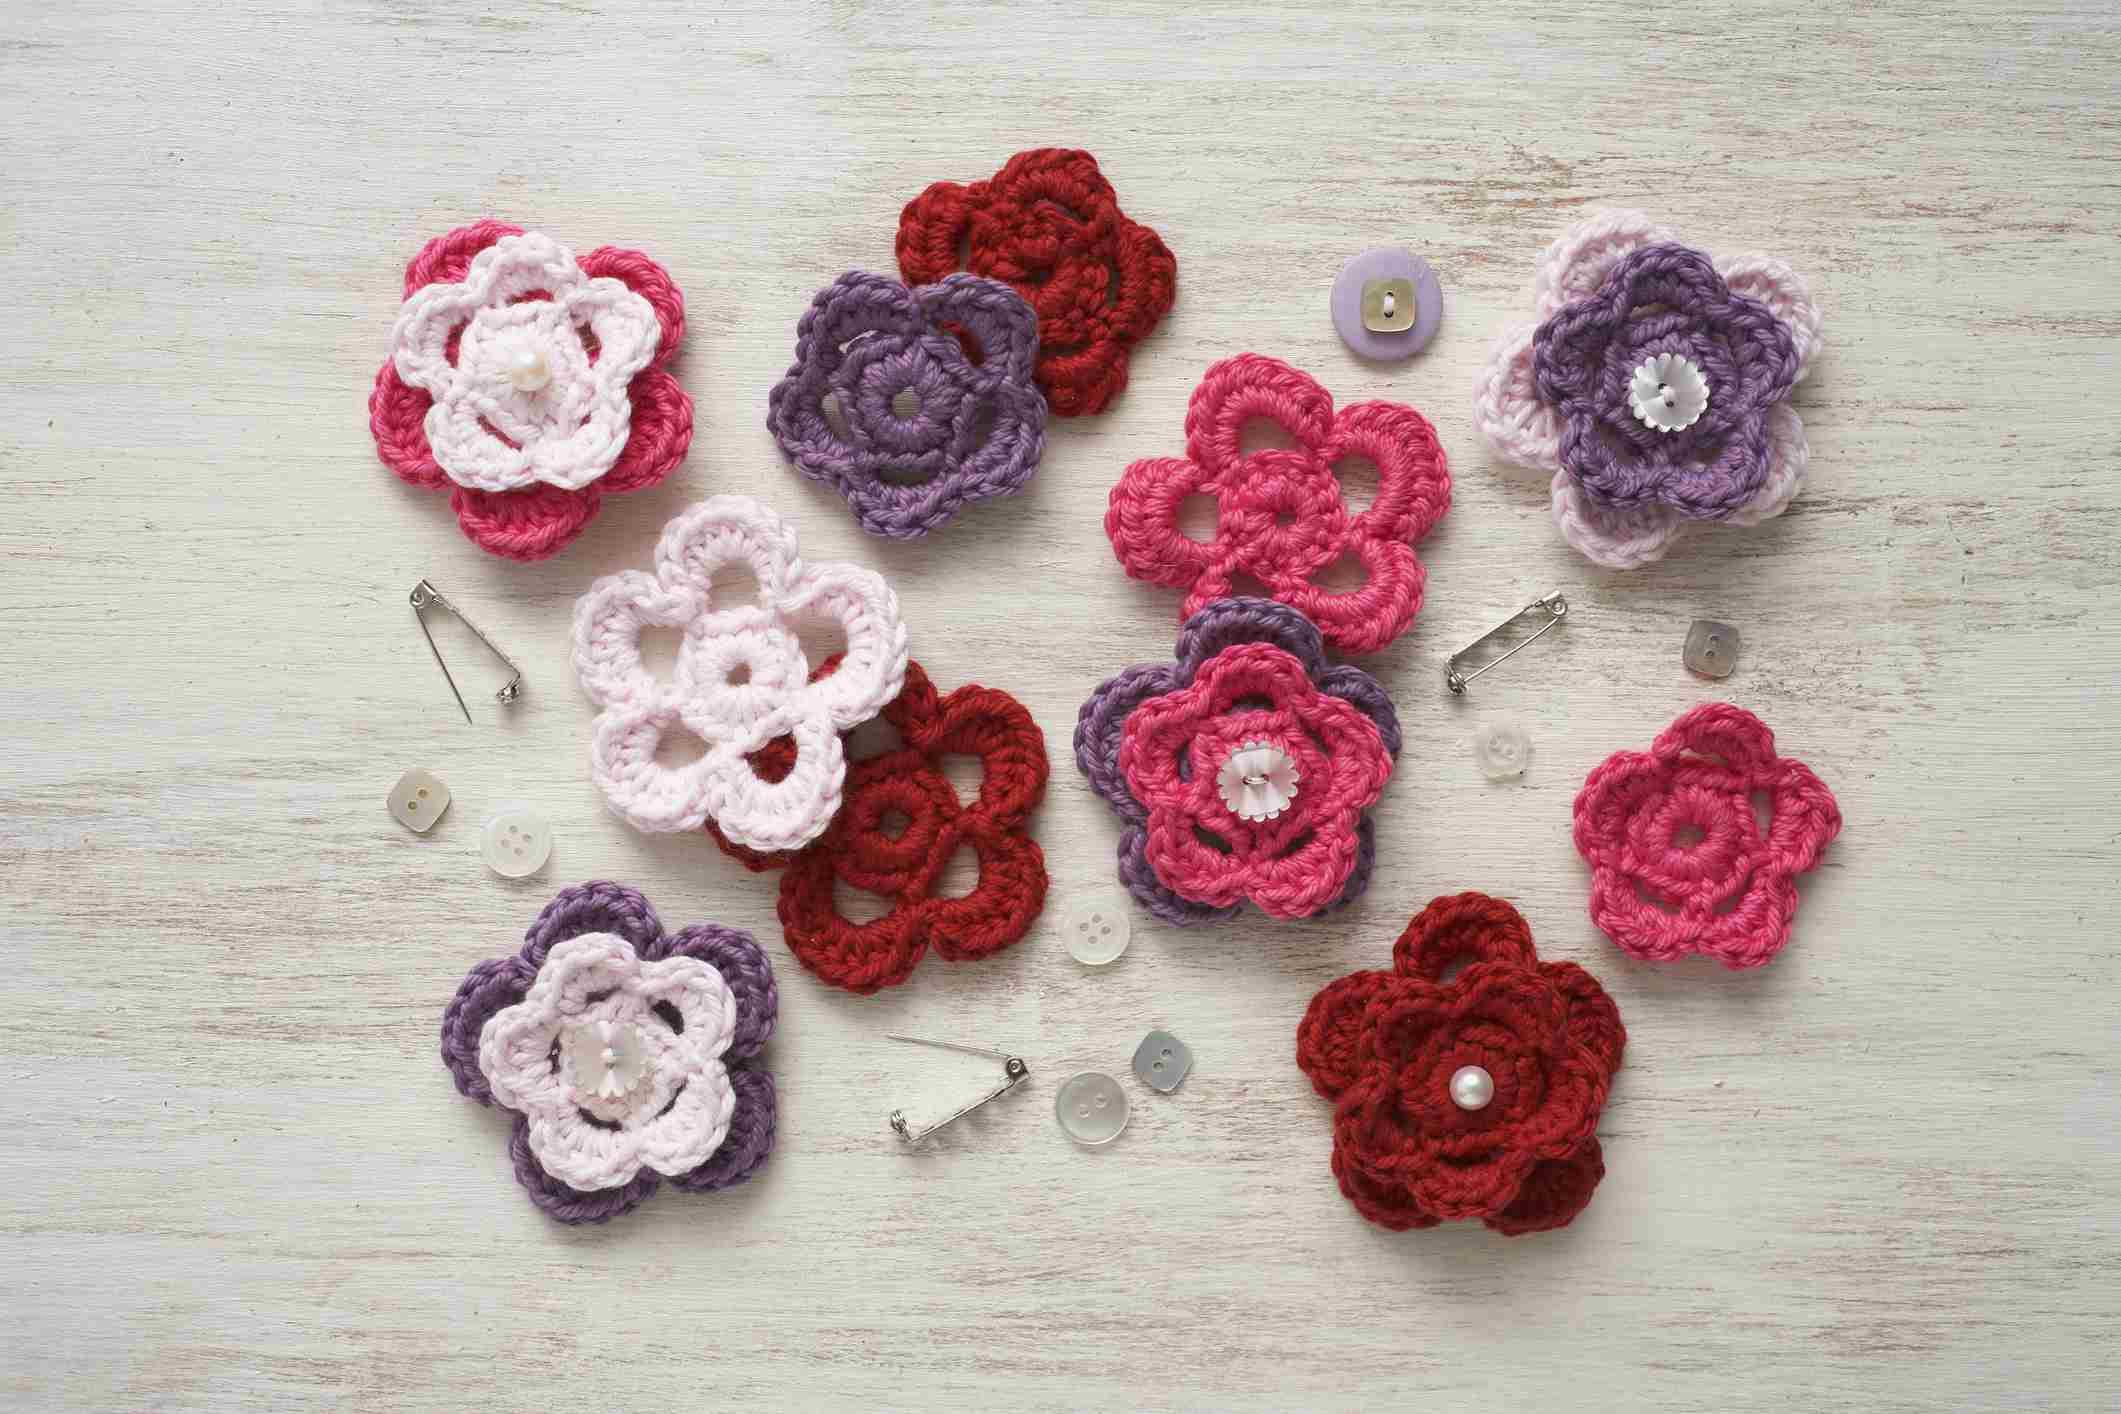 Easy crochet patterns for free crochet flowers izmirmasajfo